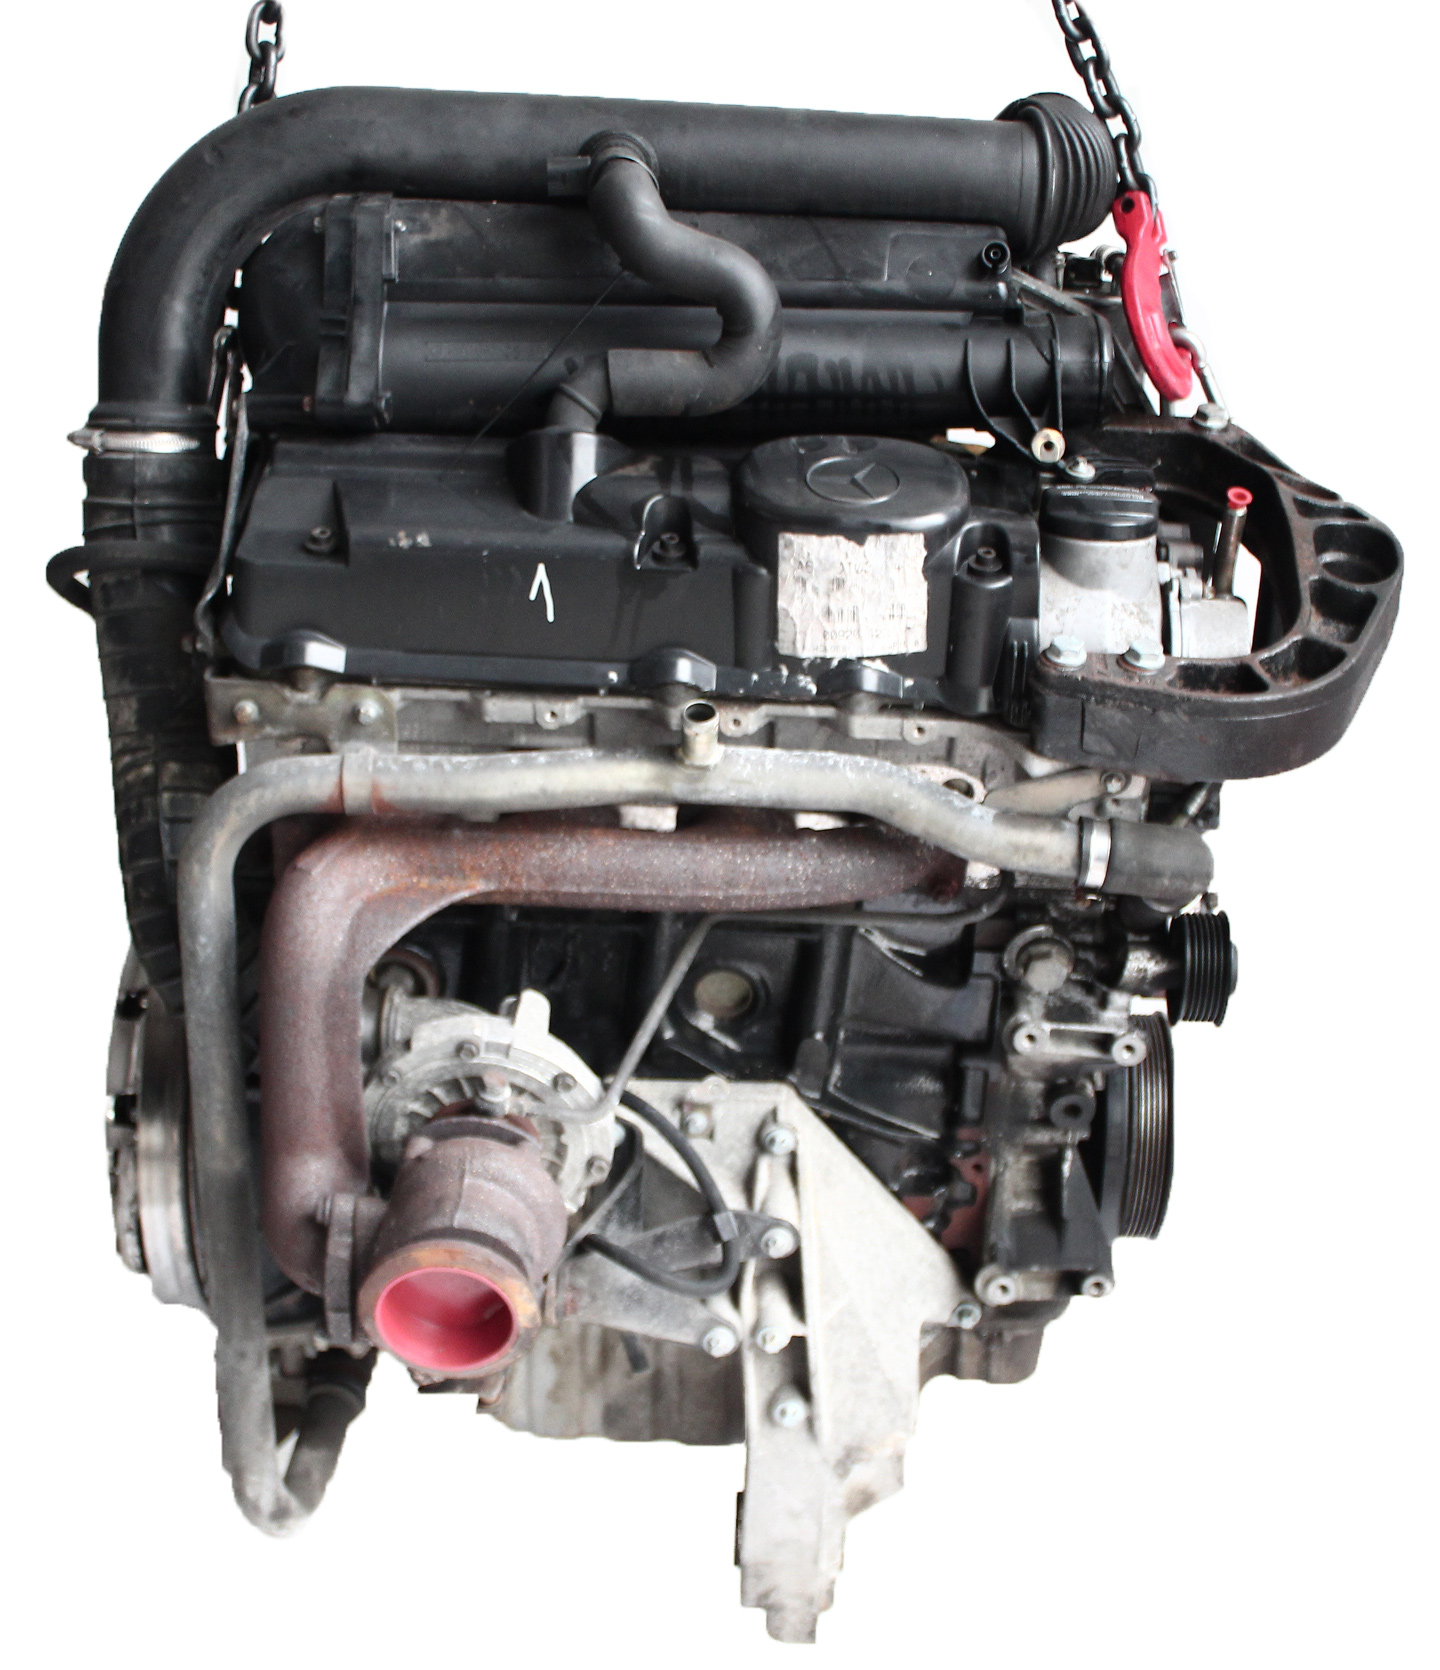 Motor 2002 Mercedes Benz Vito 638 V-Klasse 2,2 CDI OM611 611.980 mit Anbauteilen